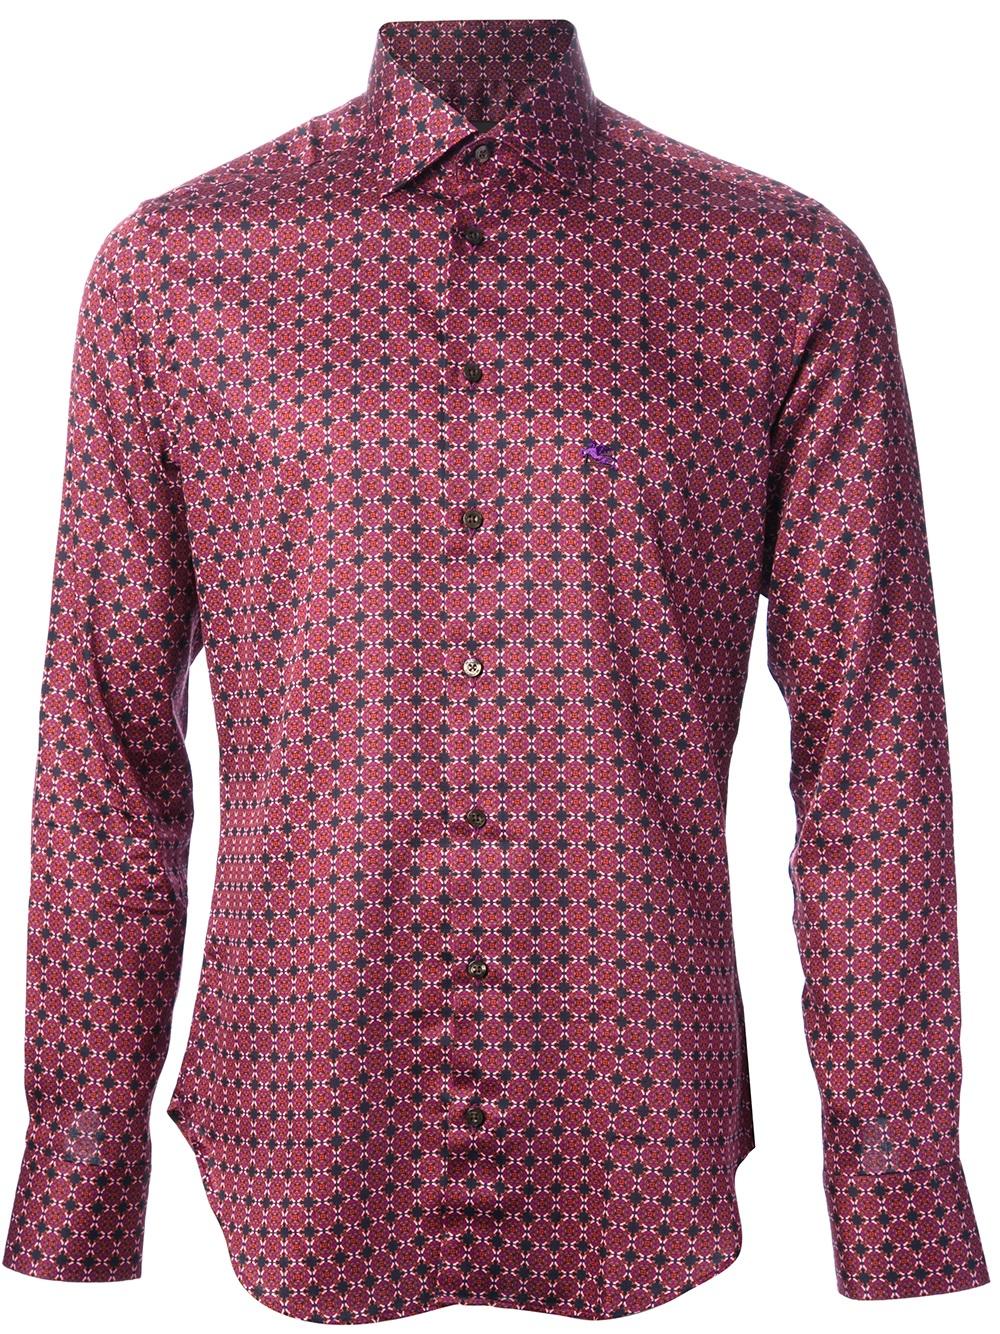 Etro dress shirt in purple for men pink purple lyst for Etro men s shirts